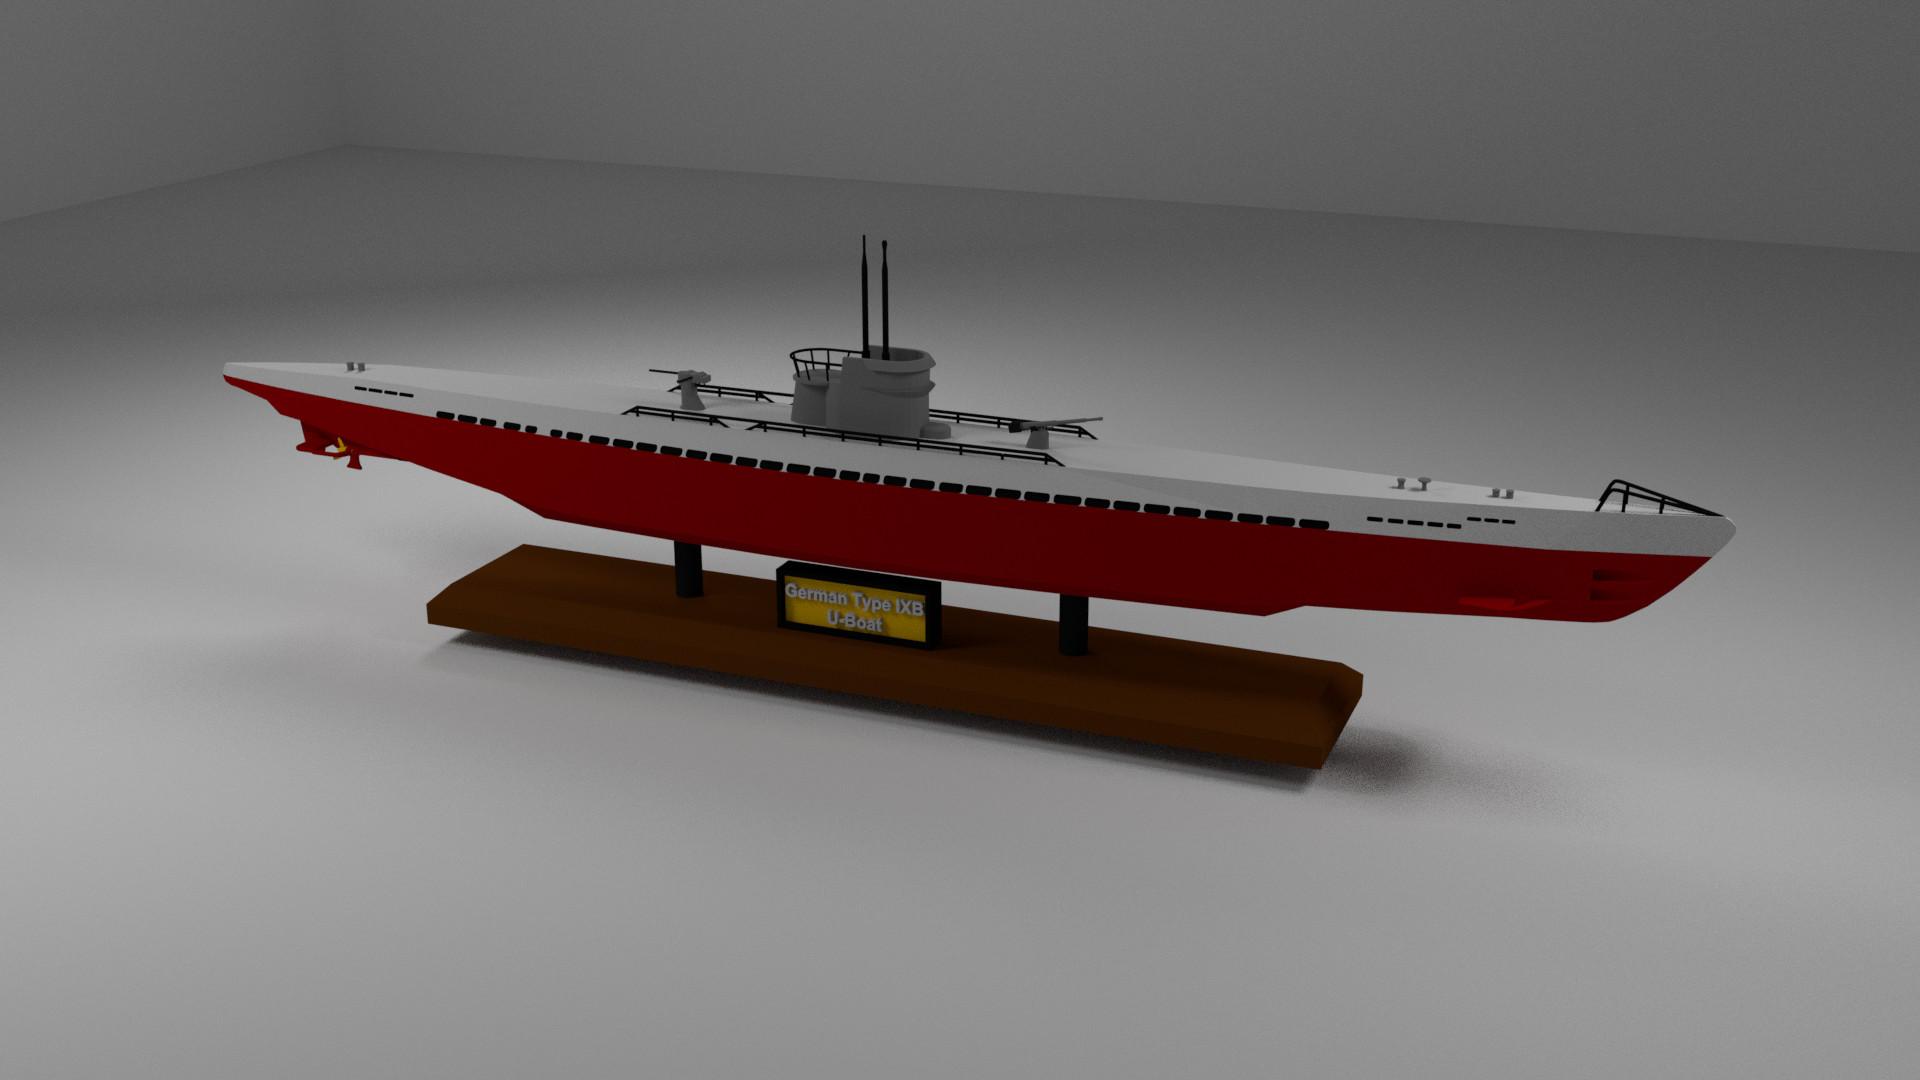 artstation - german type ixb wwii u-boat, austin bordal